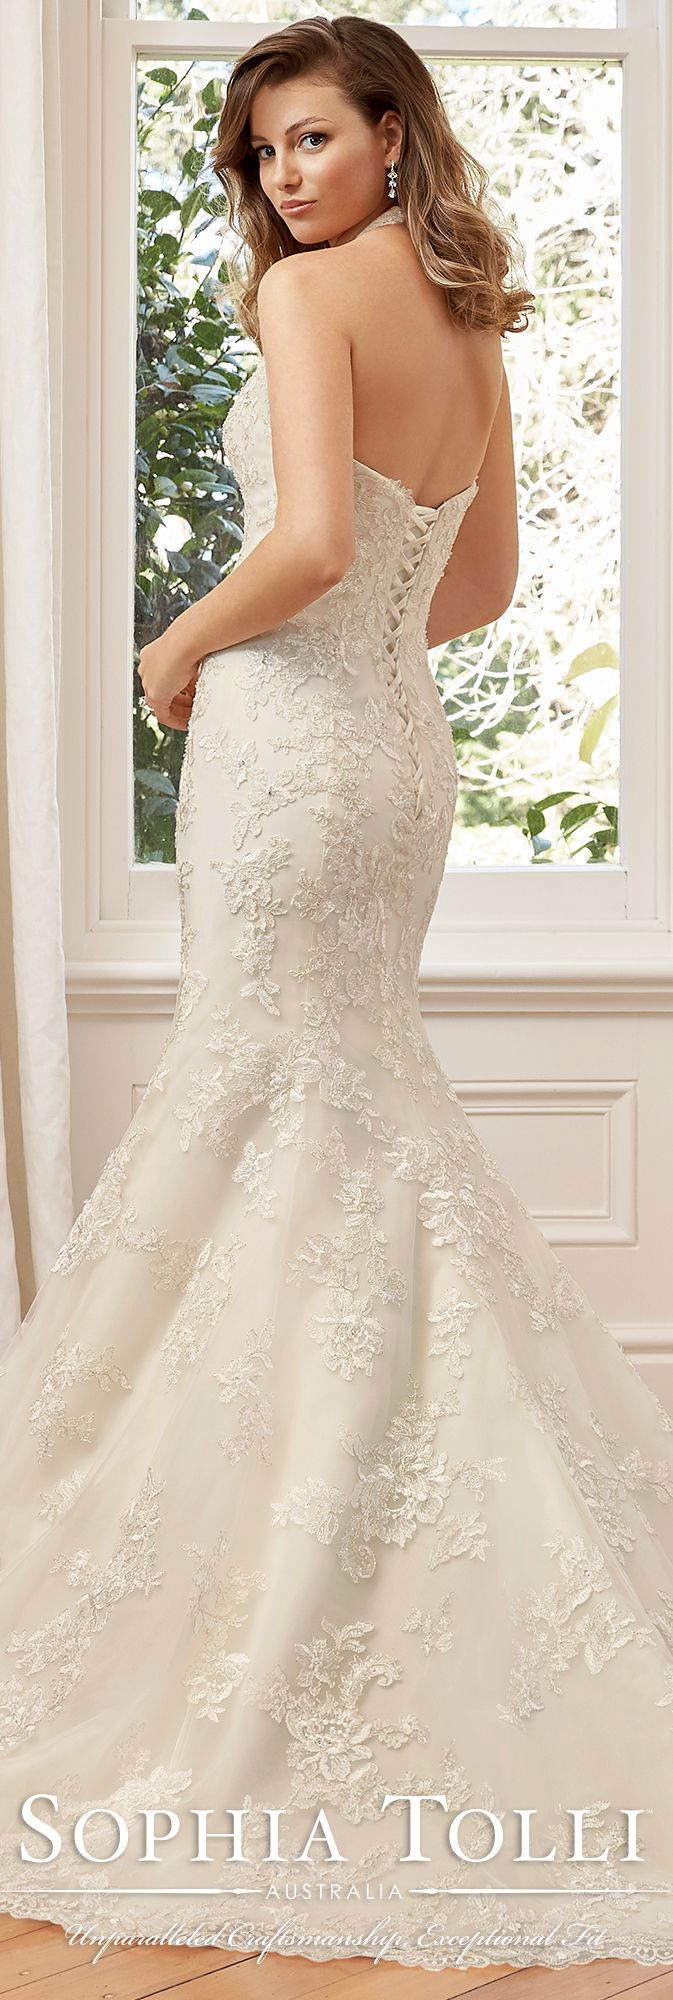 f69cecb26140 Halter V-Neckline Soft Tulle   Organza   Lace Dress- Y11942 Marnie ...